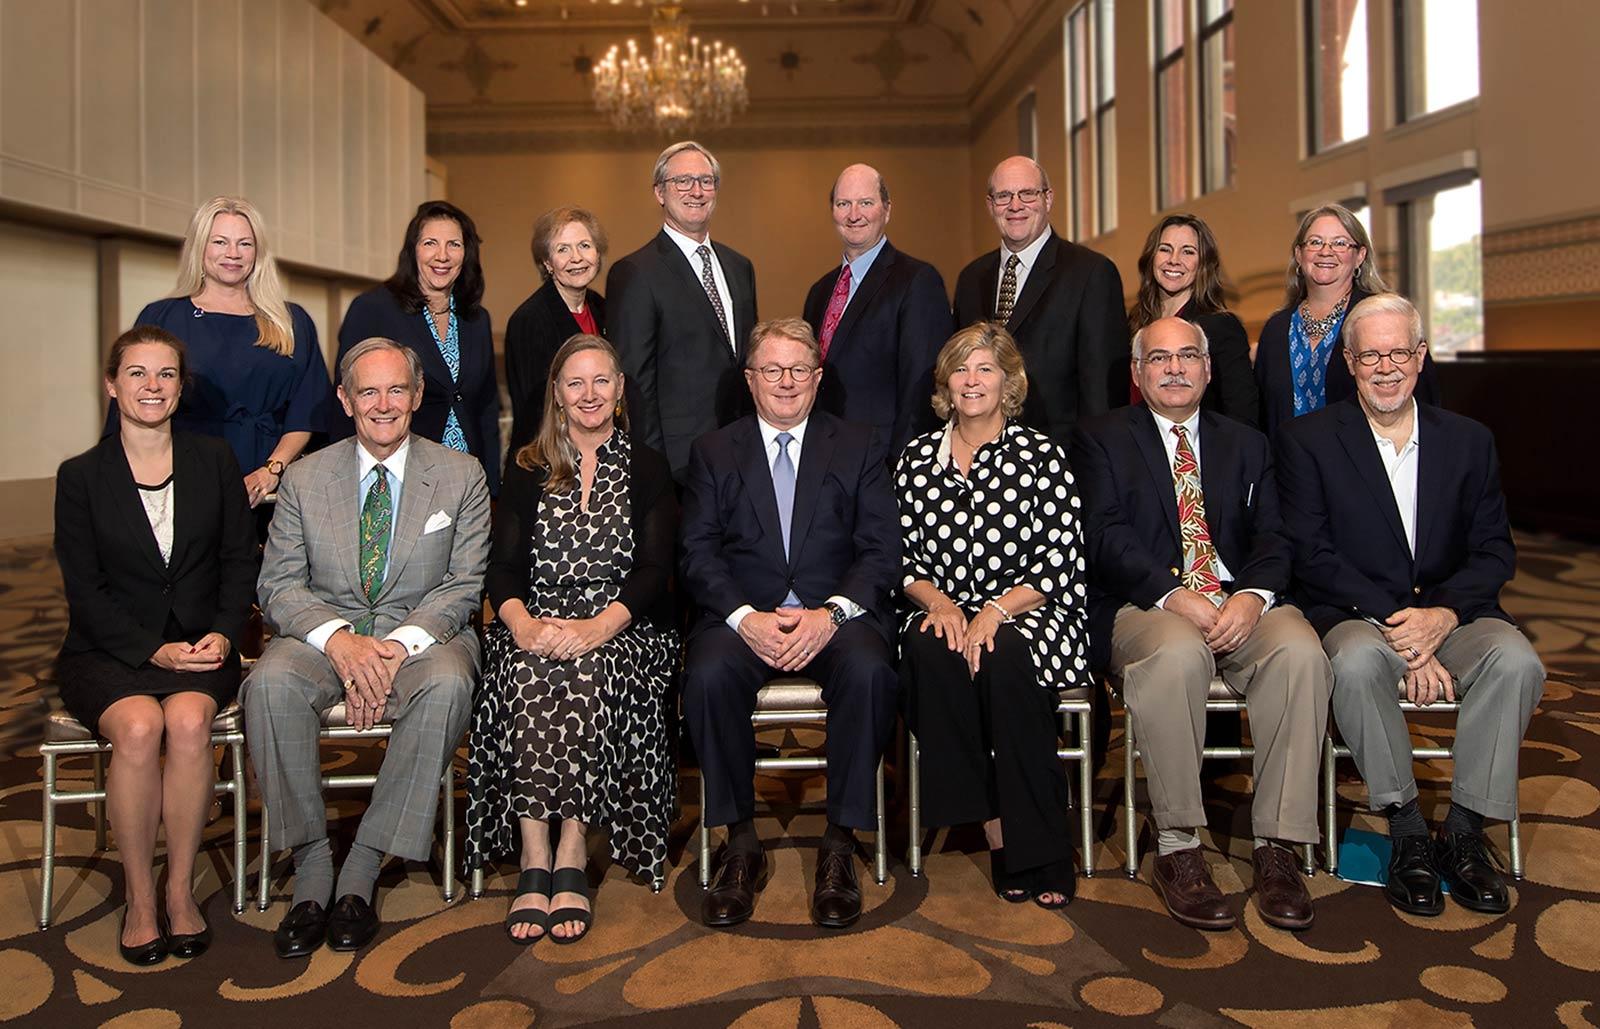 SPMH Board of Directors, 2018-2019